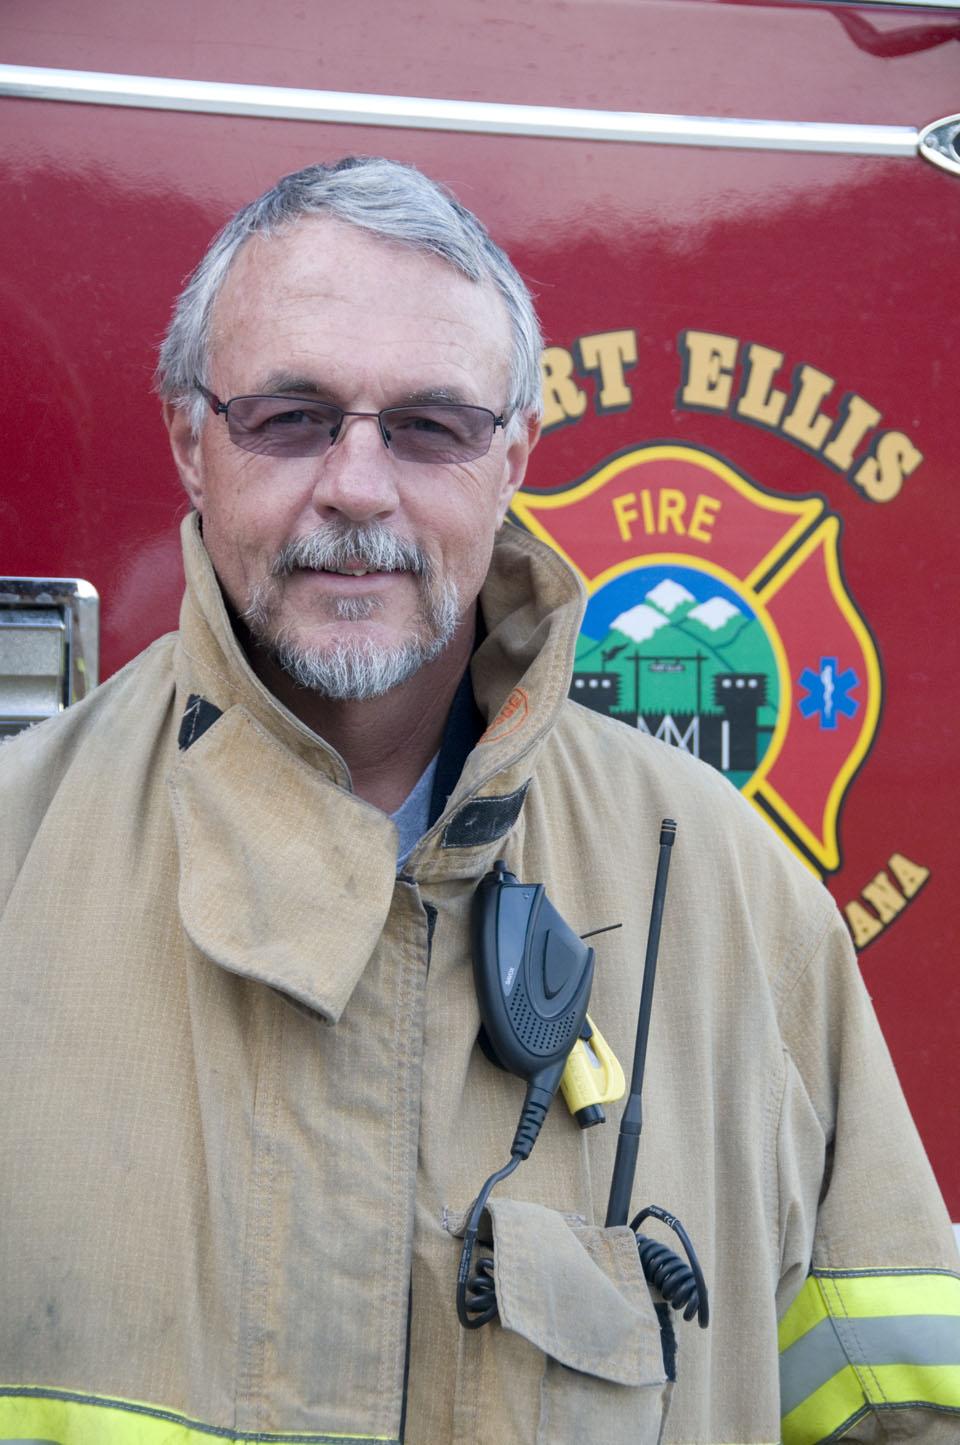 Fort Ellis Fire Chief Mike Cech